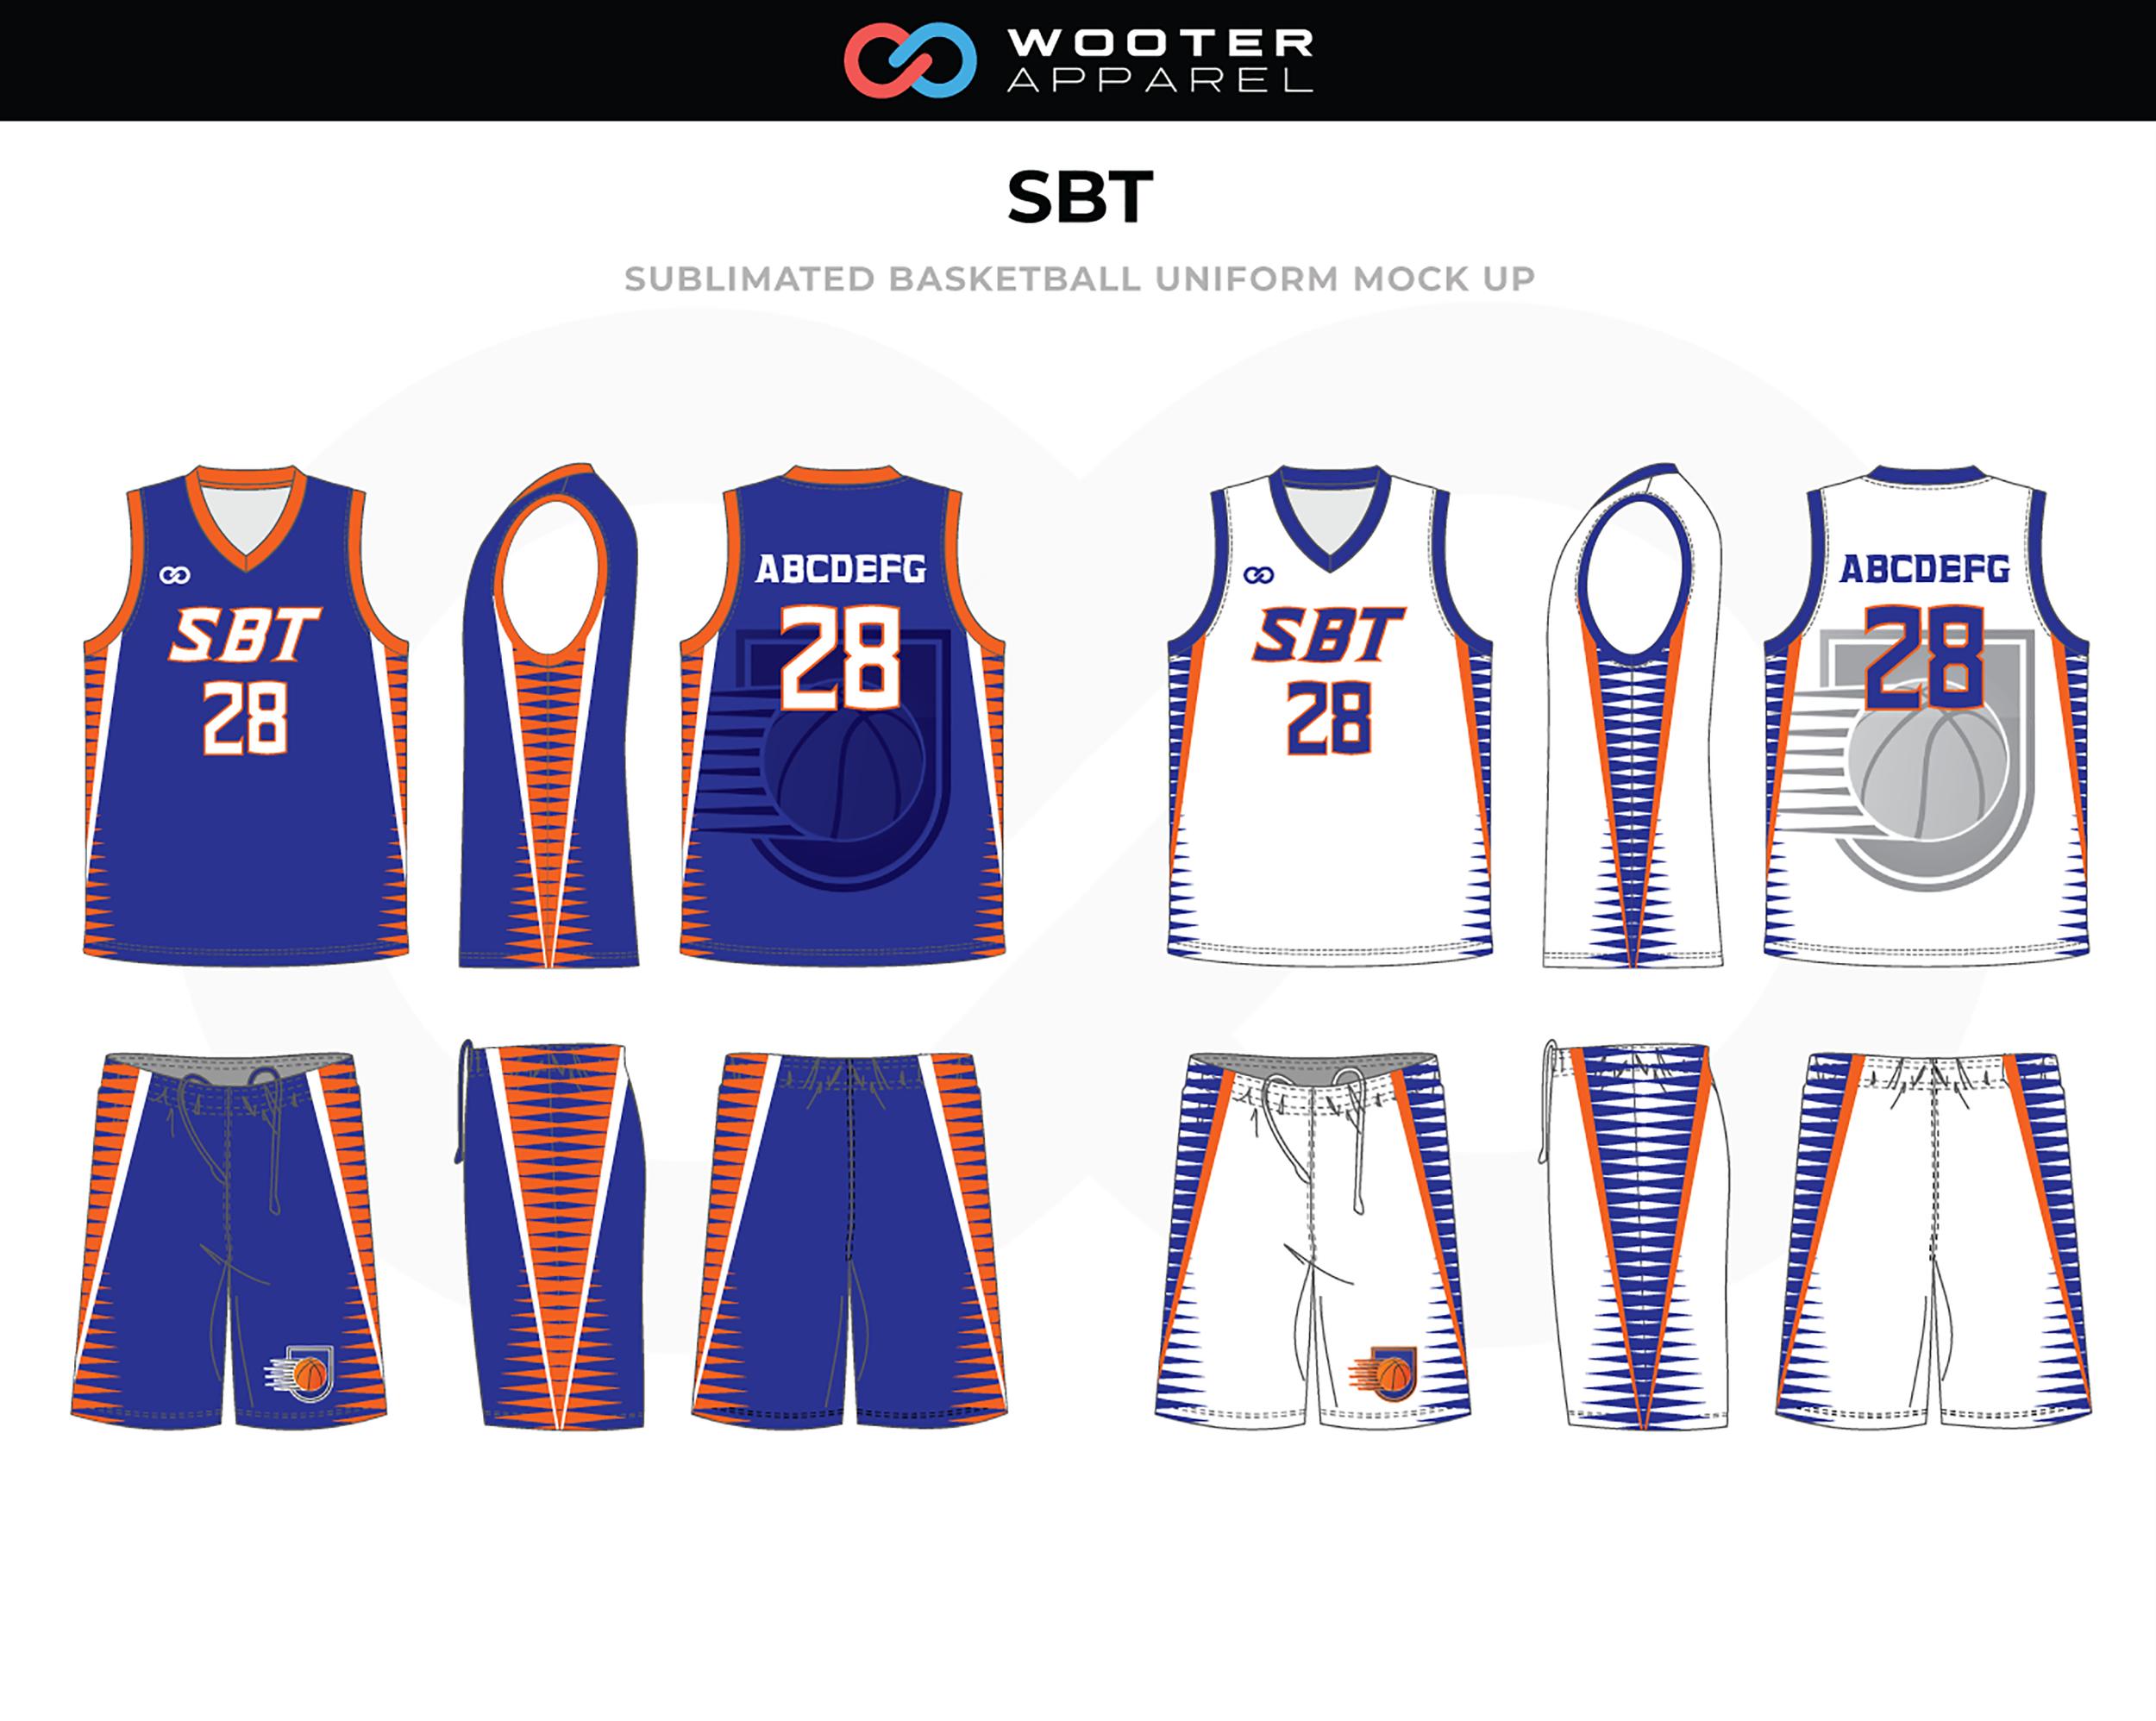 SBT Blue White Orange Blue Basketball Uniform, Jersey and Shorts